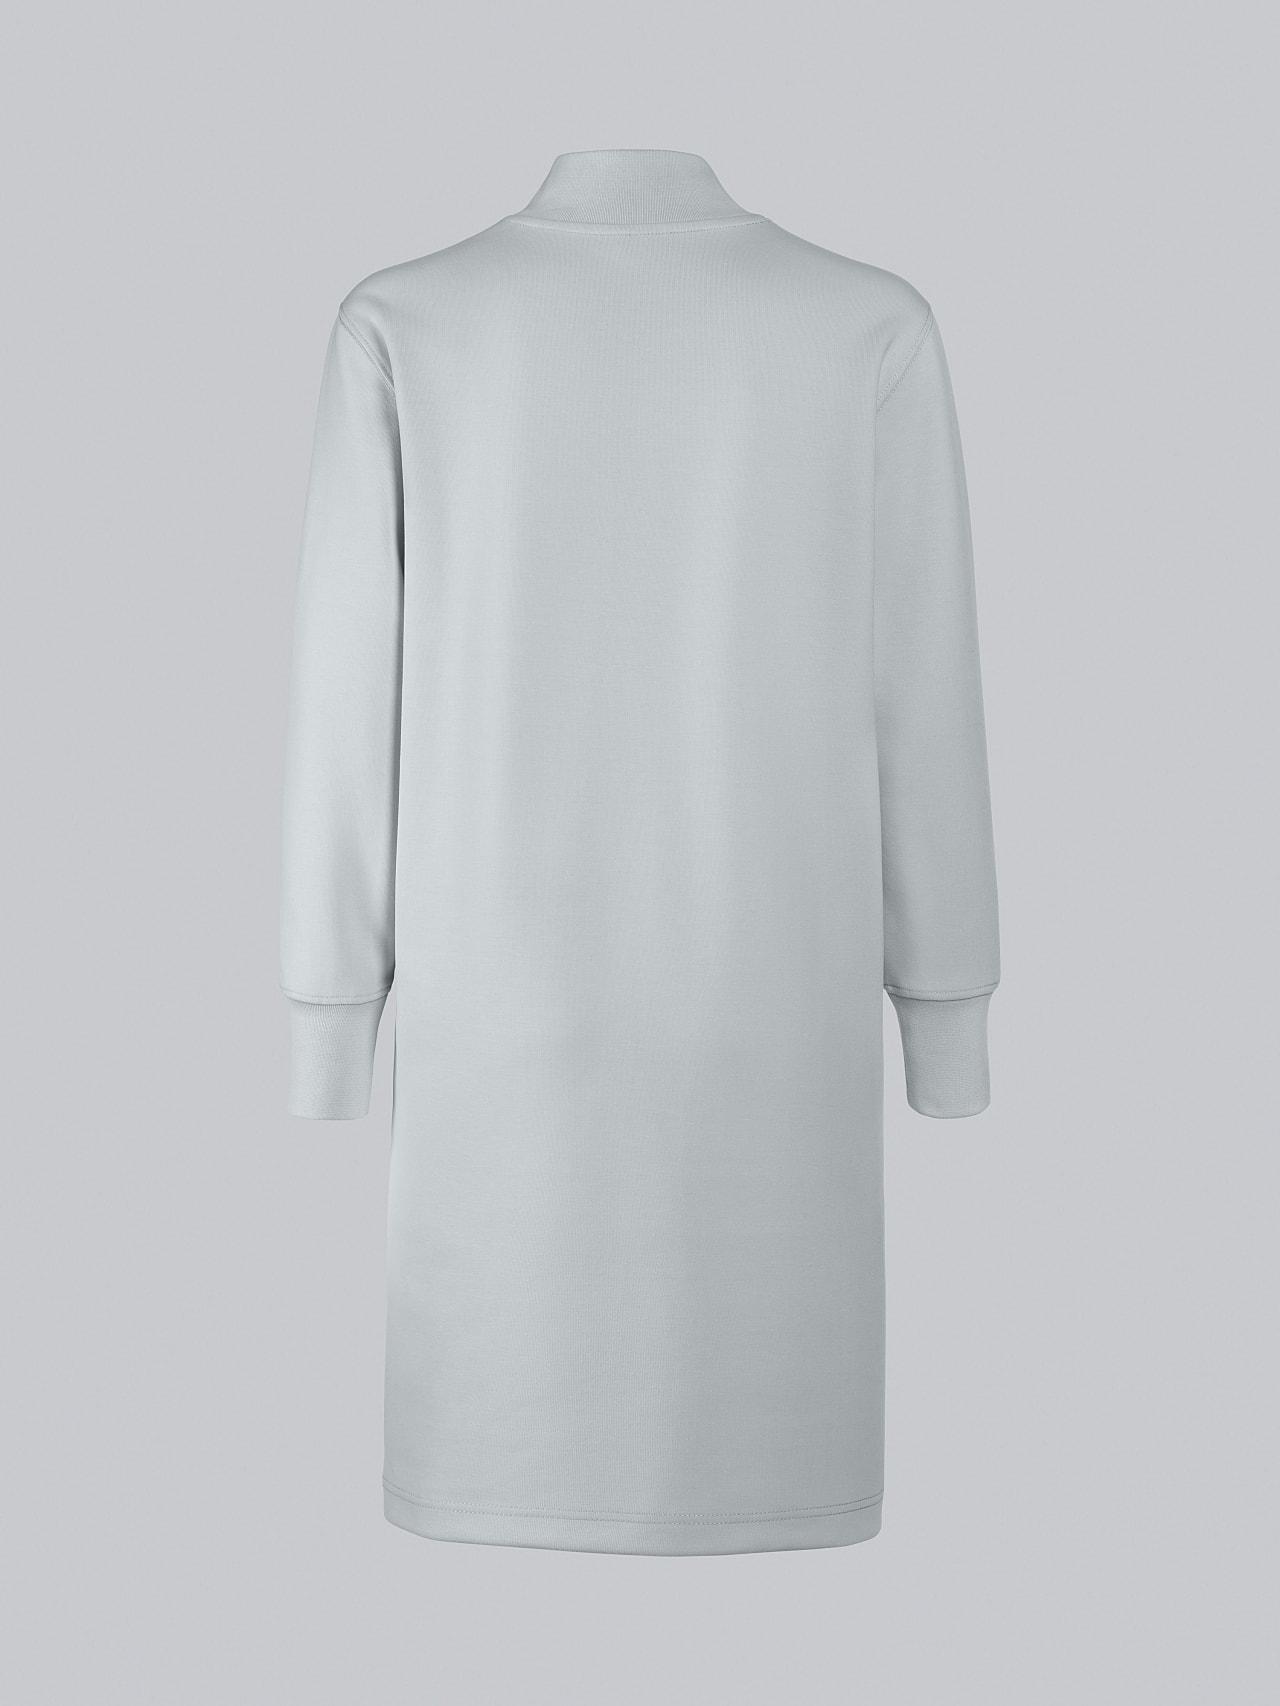 STAR V3.Y5.02 Premium Logo Sweater Dress Pale Blue  Left Alpha Tauri